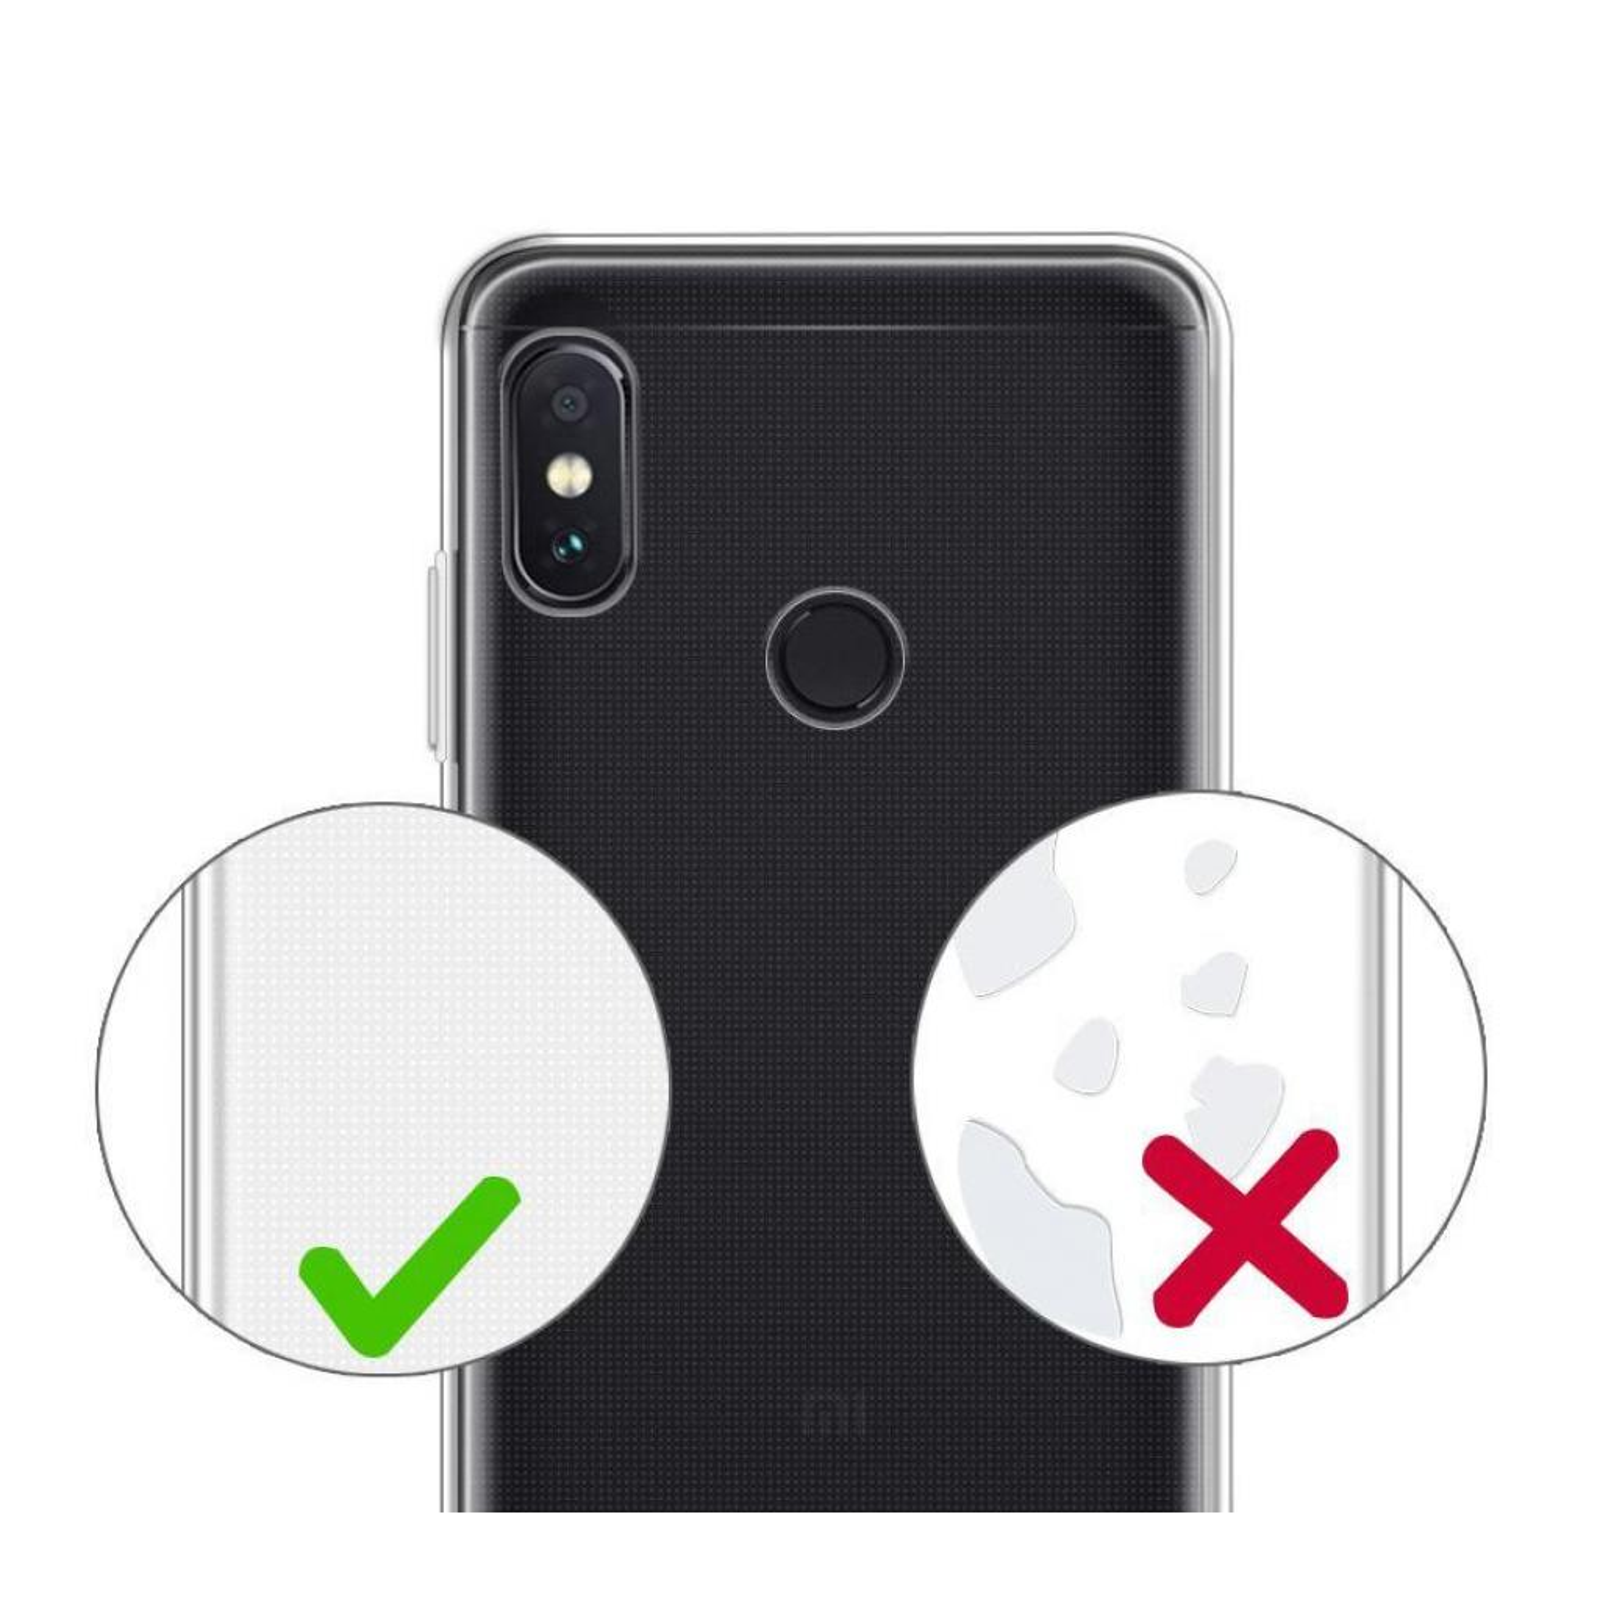 Чехол для моб. телефона Laudtec для Xiaomi Redmi Note 5 Pro Clear tpu (Transperent) (LC-XRN5P) изображение 7